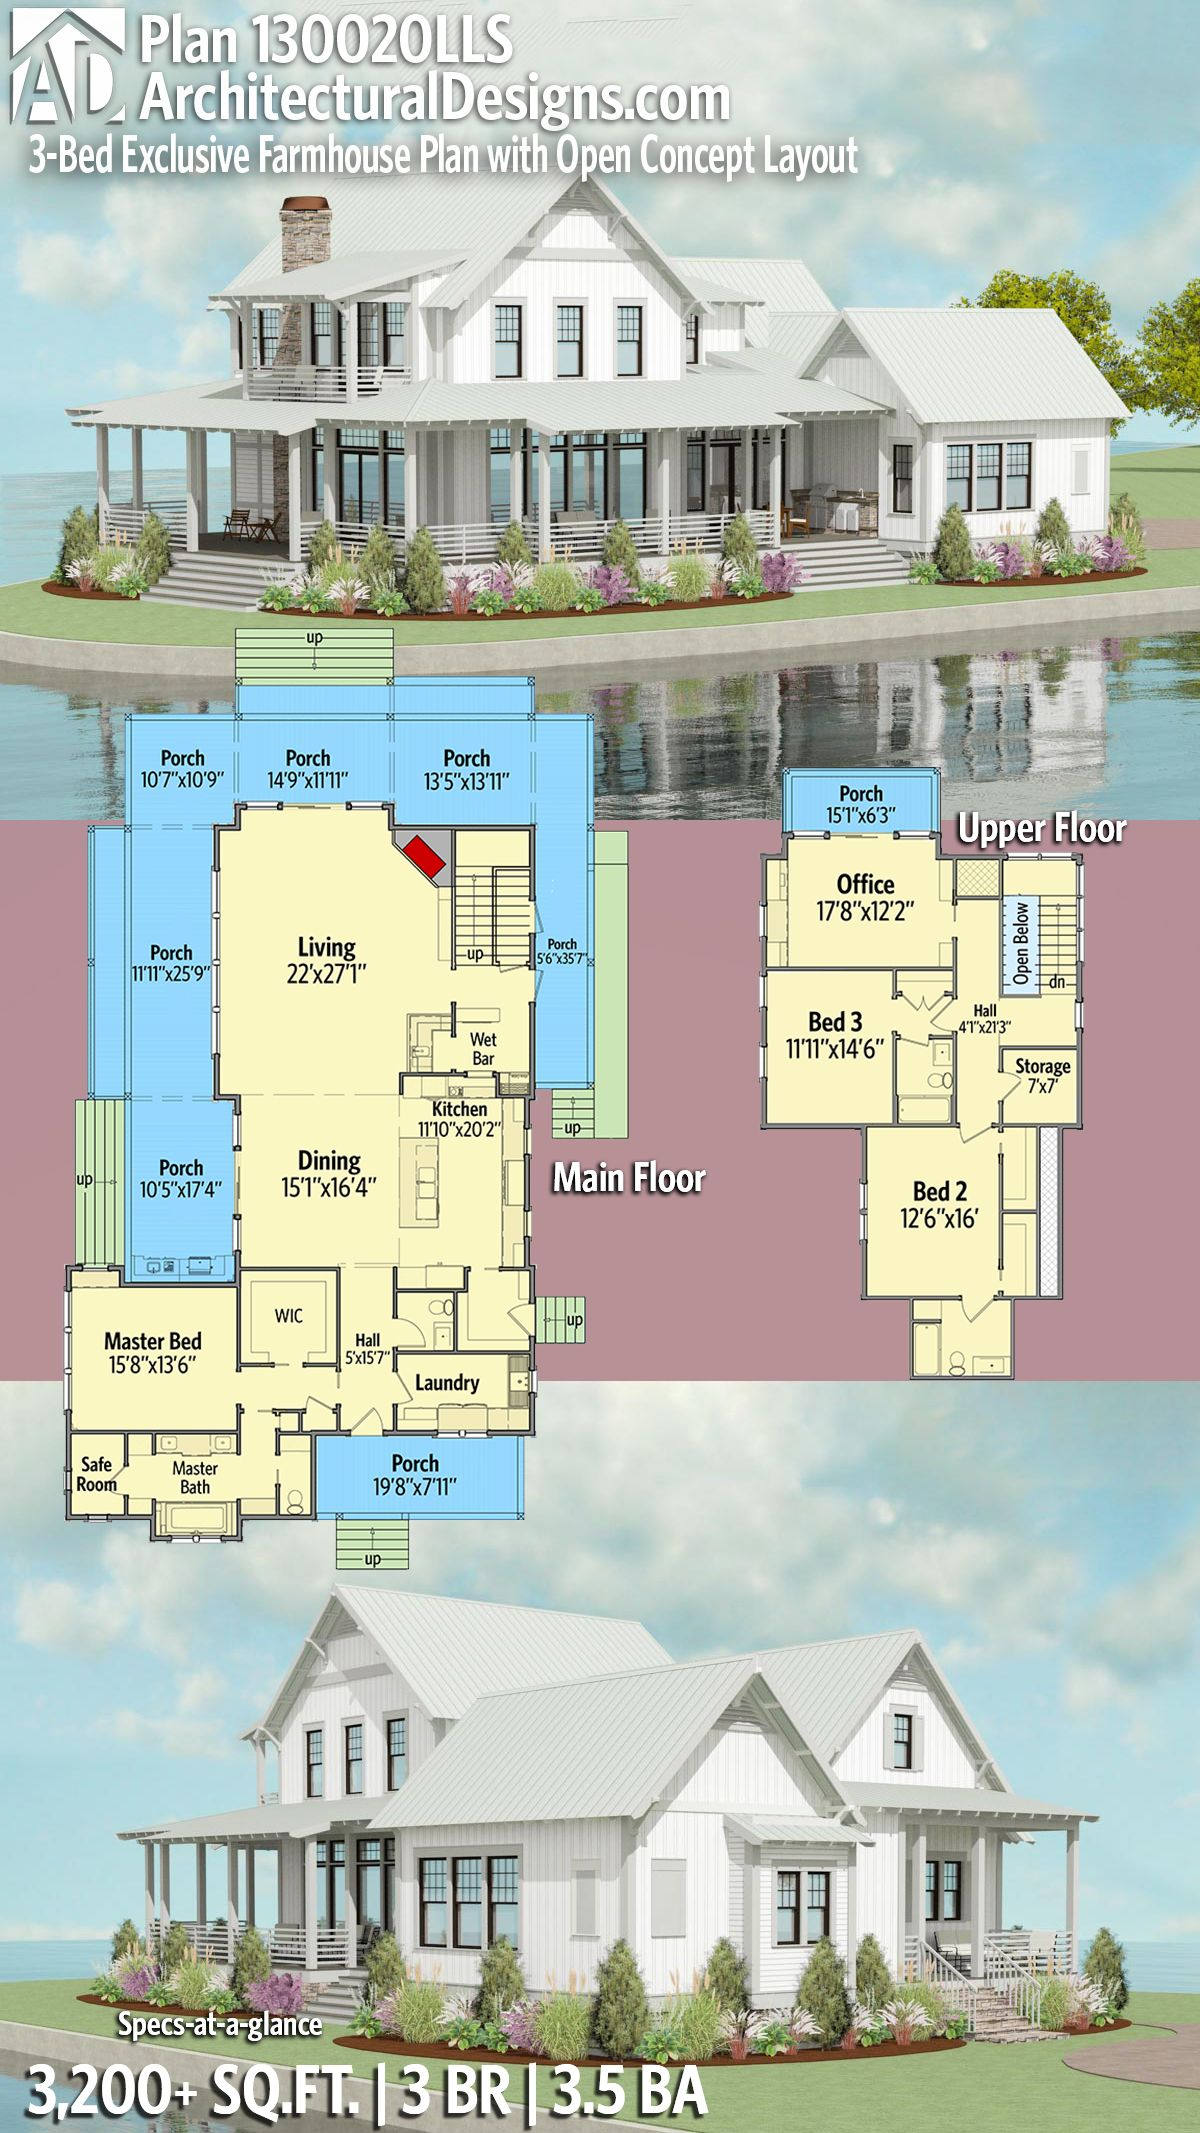 Architectural Designs Exclusive Modern Farmhouse House Plan 130020lls 3 Beds 3 5 Baths 3 2 House Plans Farmhouse Modern Farmhouse Plans Dream House Plans